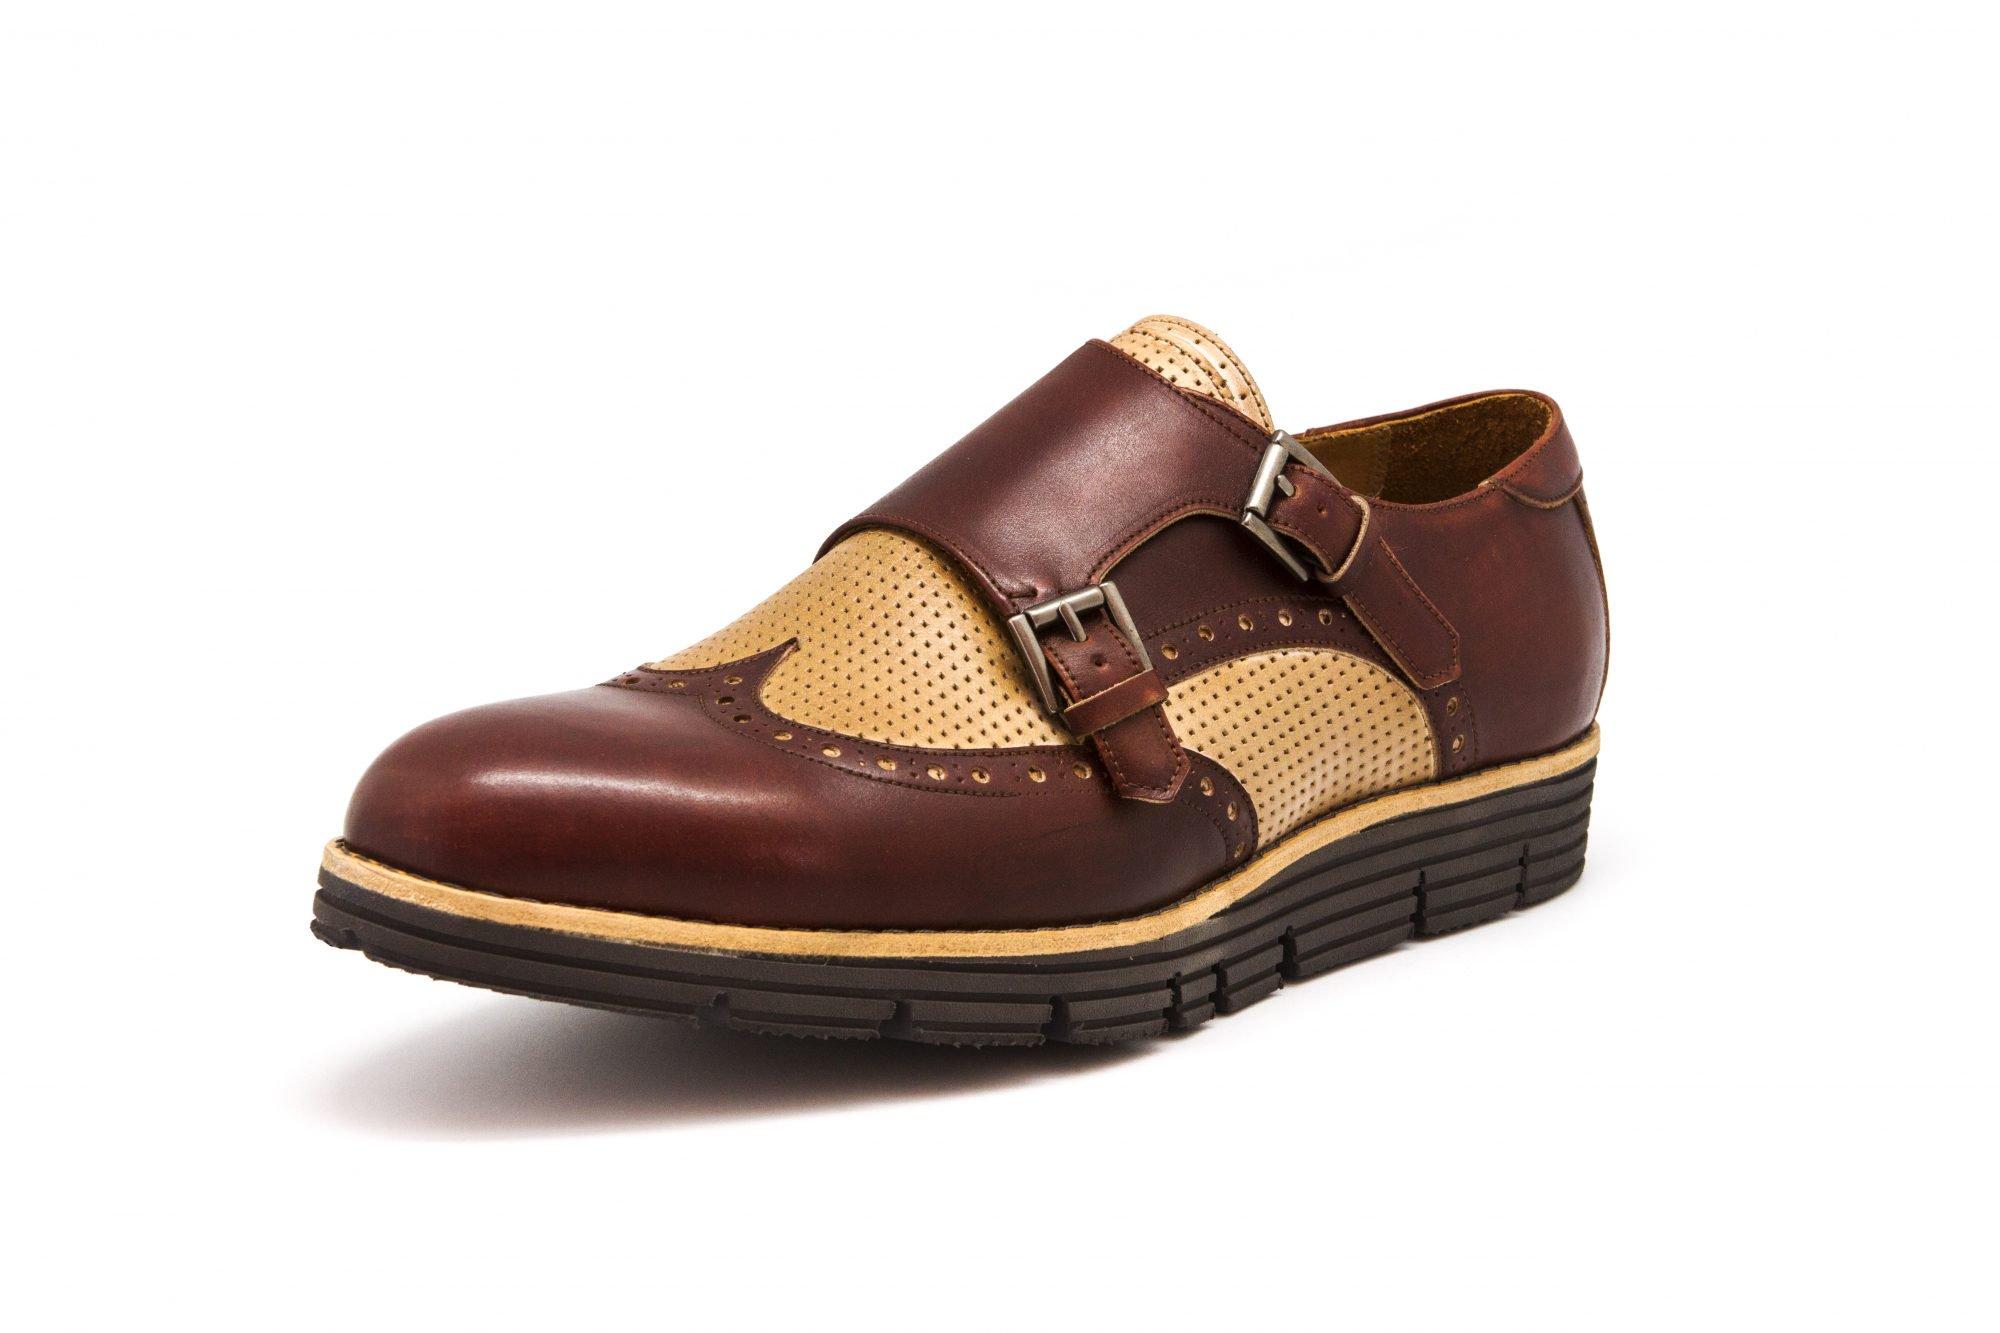 Sapatos Perks Double Monk | Calçada